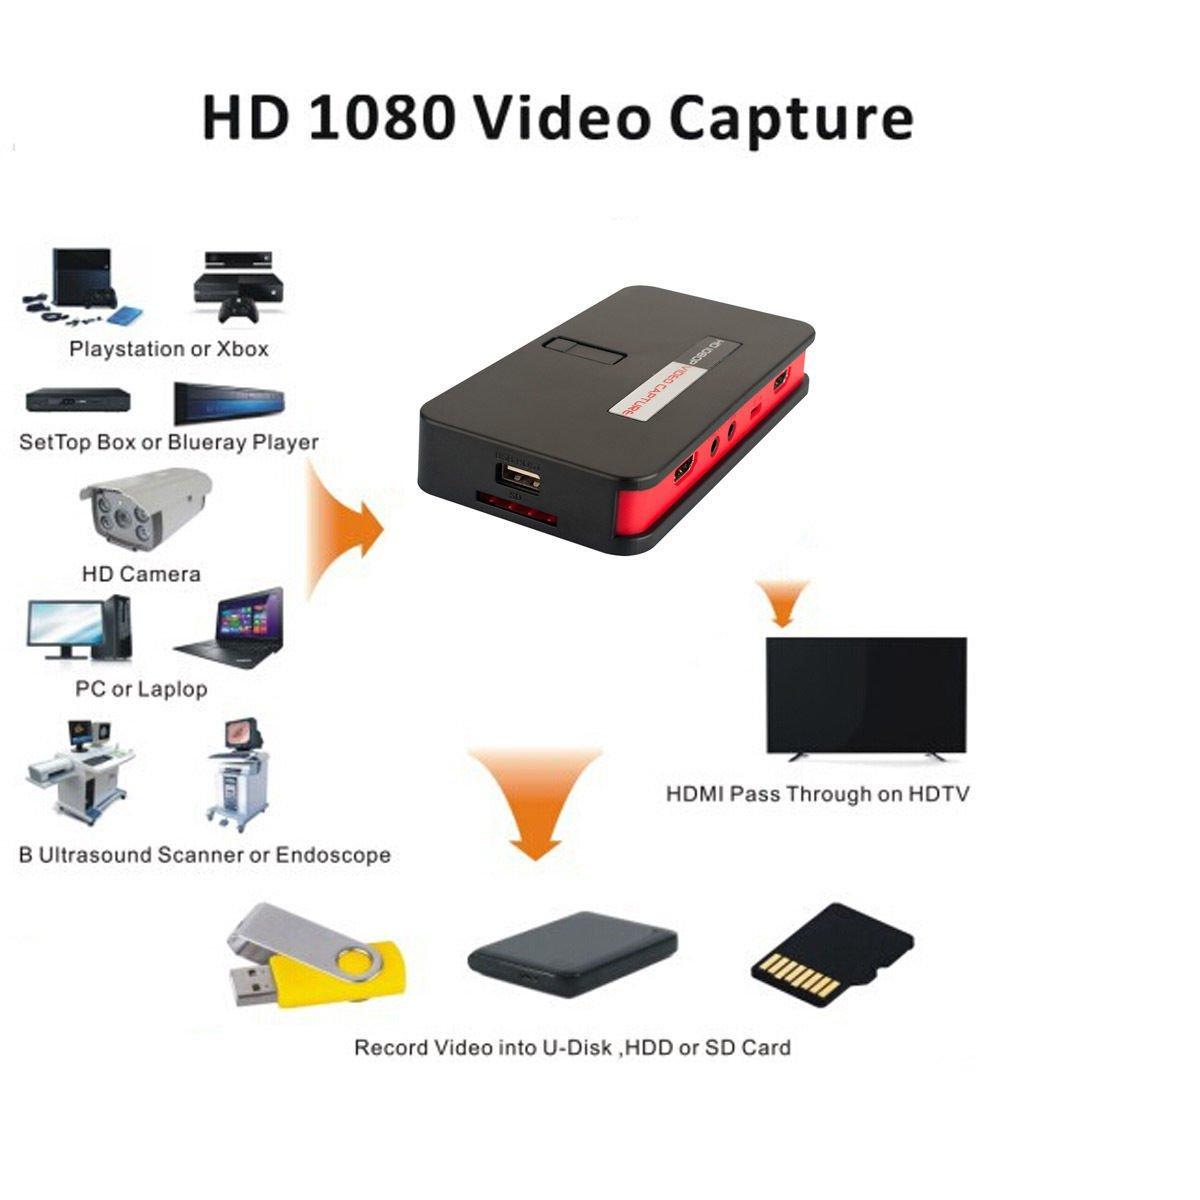 EZCAP Game Capture 1080P HD Video Capture Card Box Device